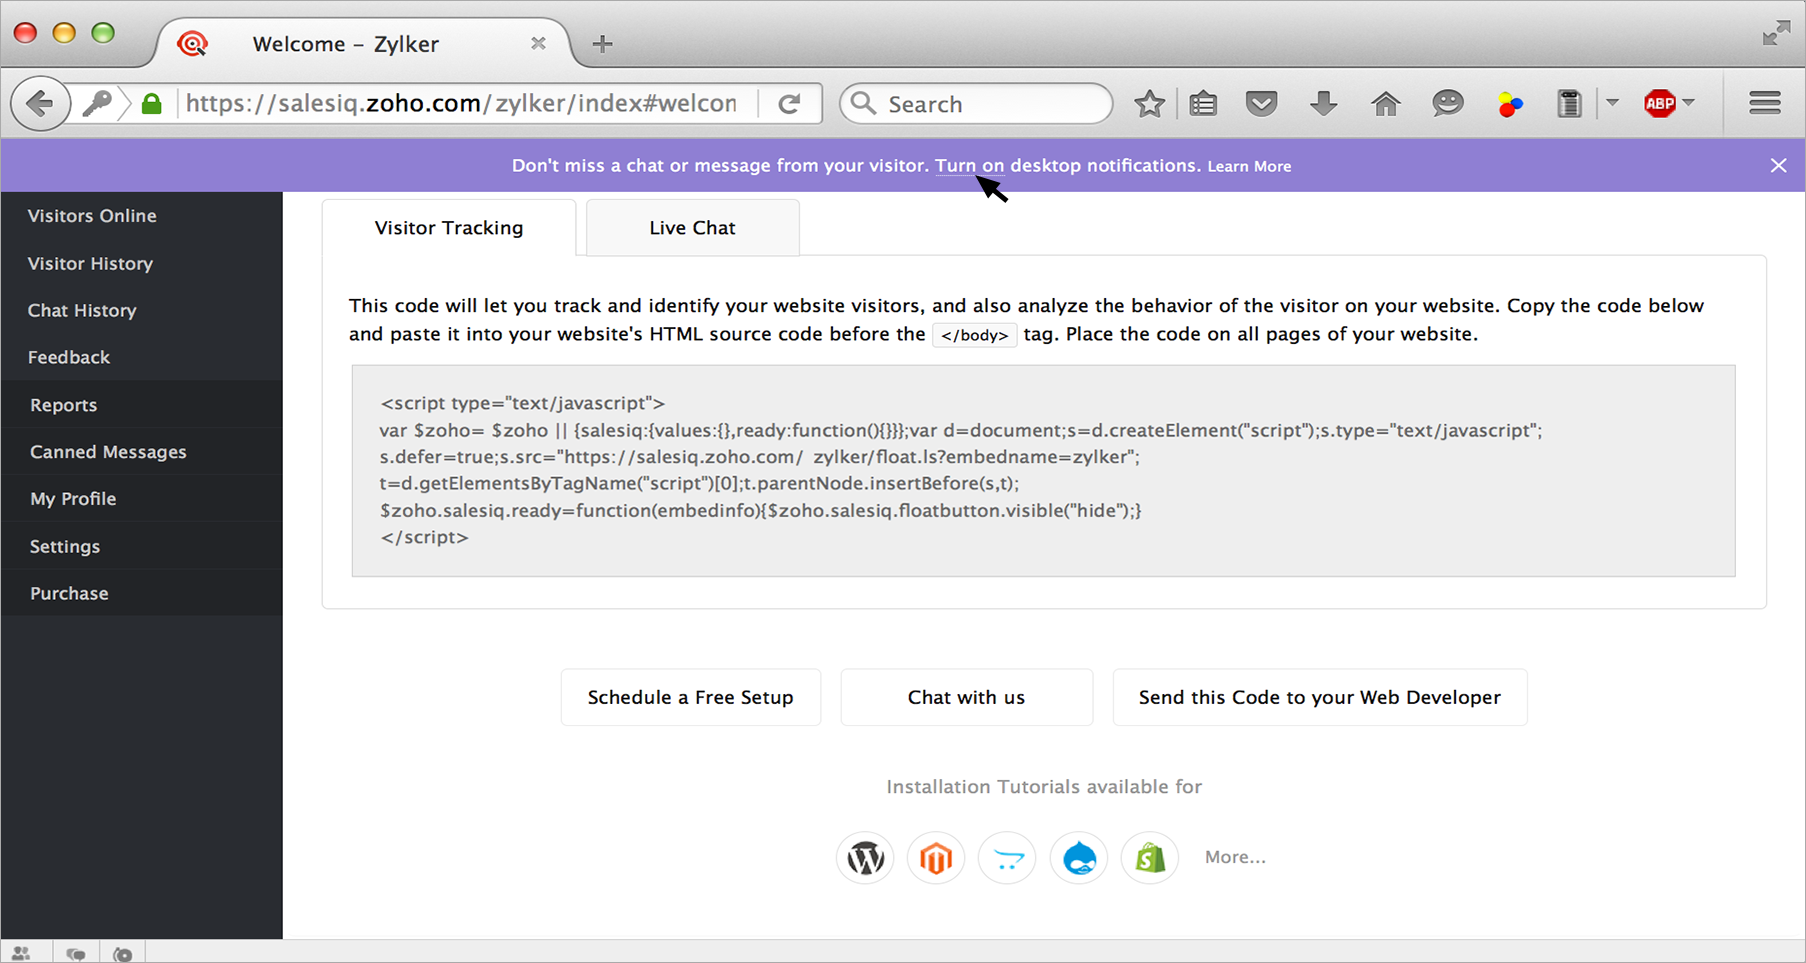 Enable desktop notification - Zoho SalesIQ